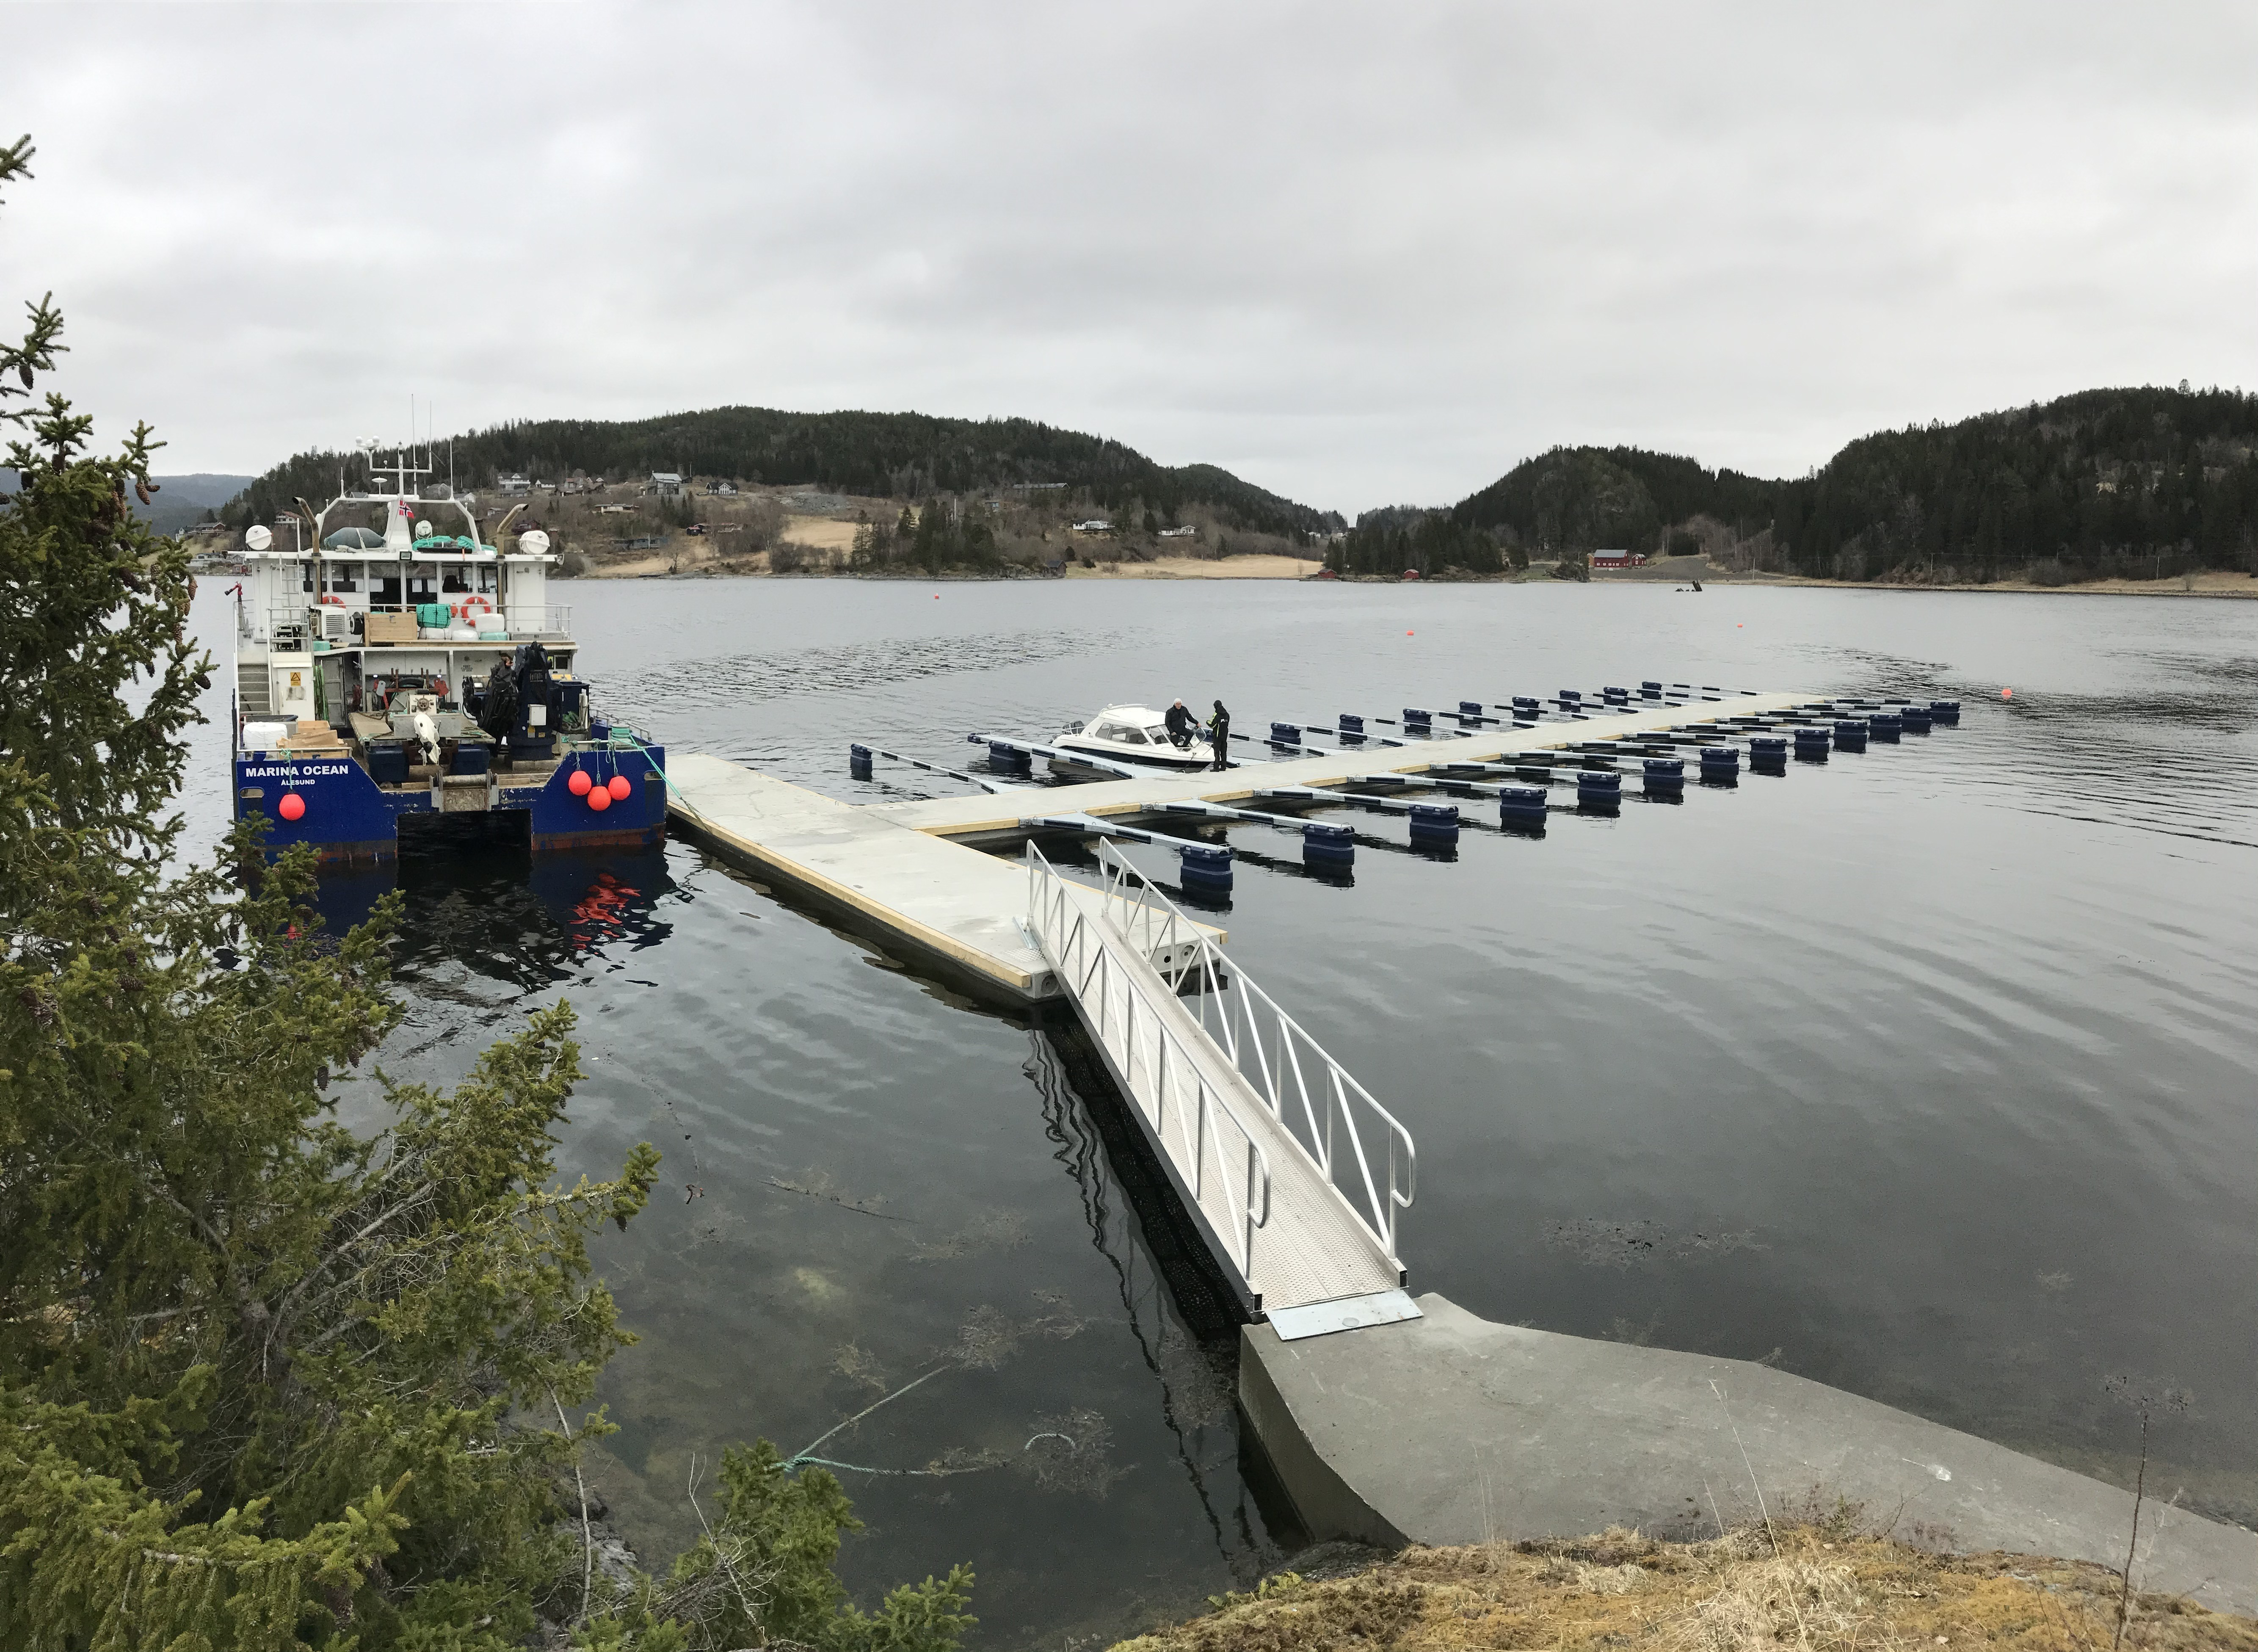 https://www.marinasolutions.no/uploads/Undli-Kai-Bryggeforening_Åsenfjord-6.jpg